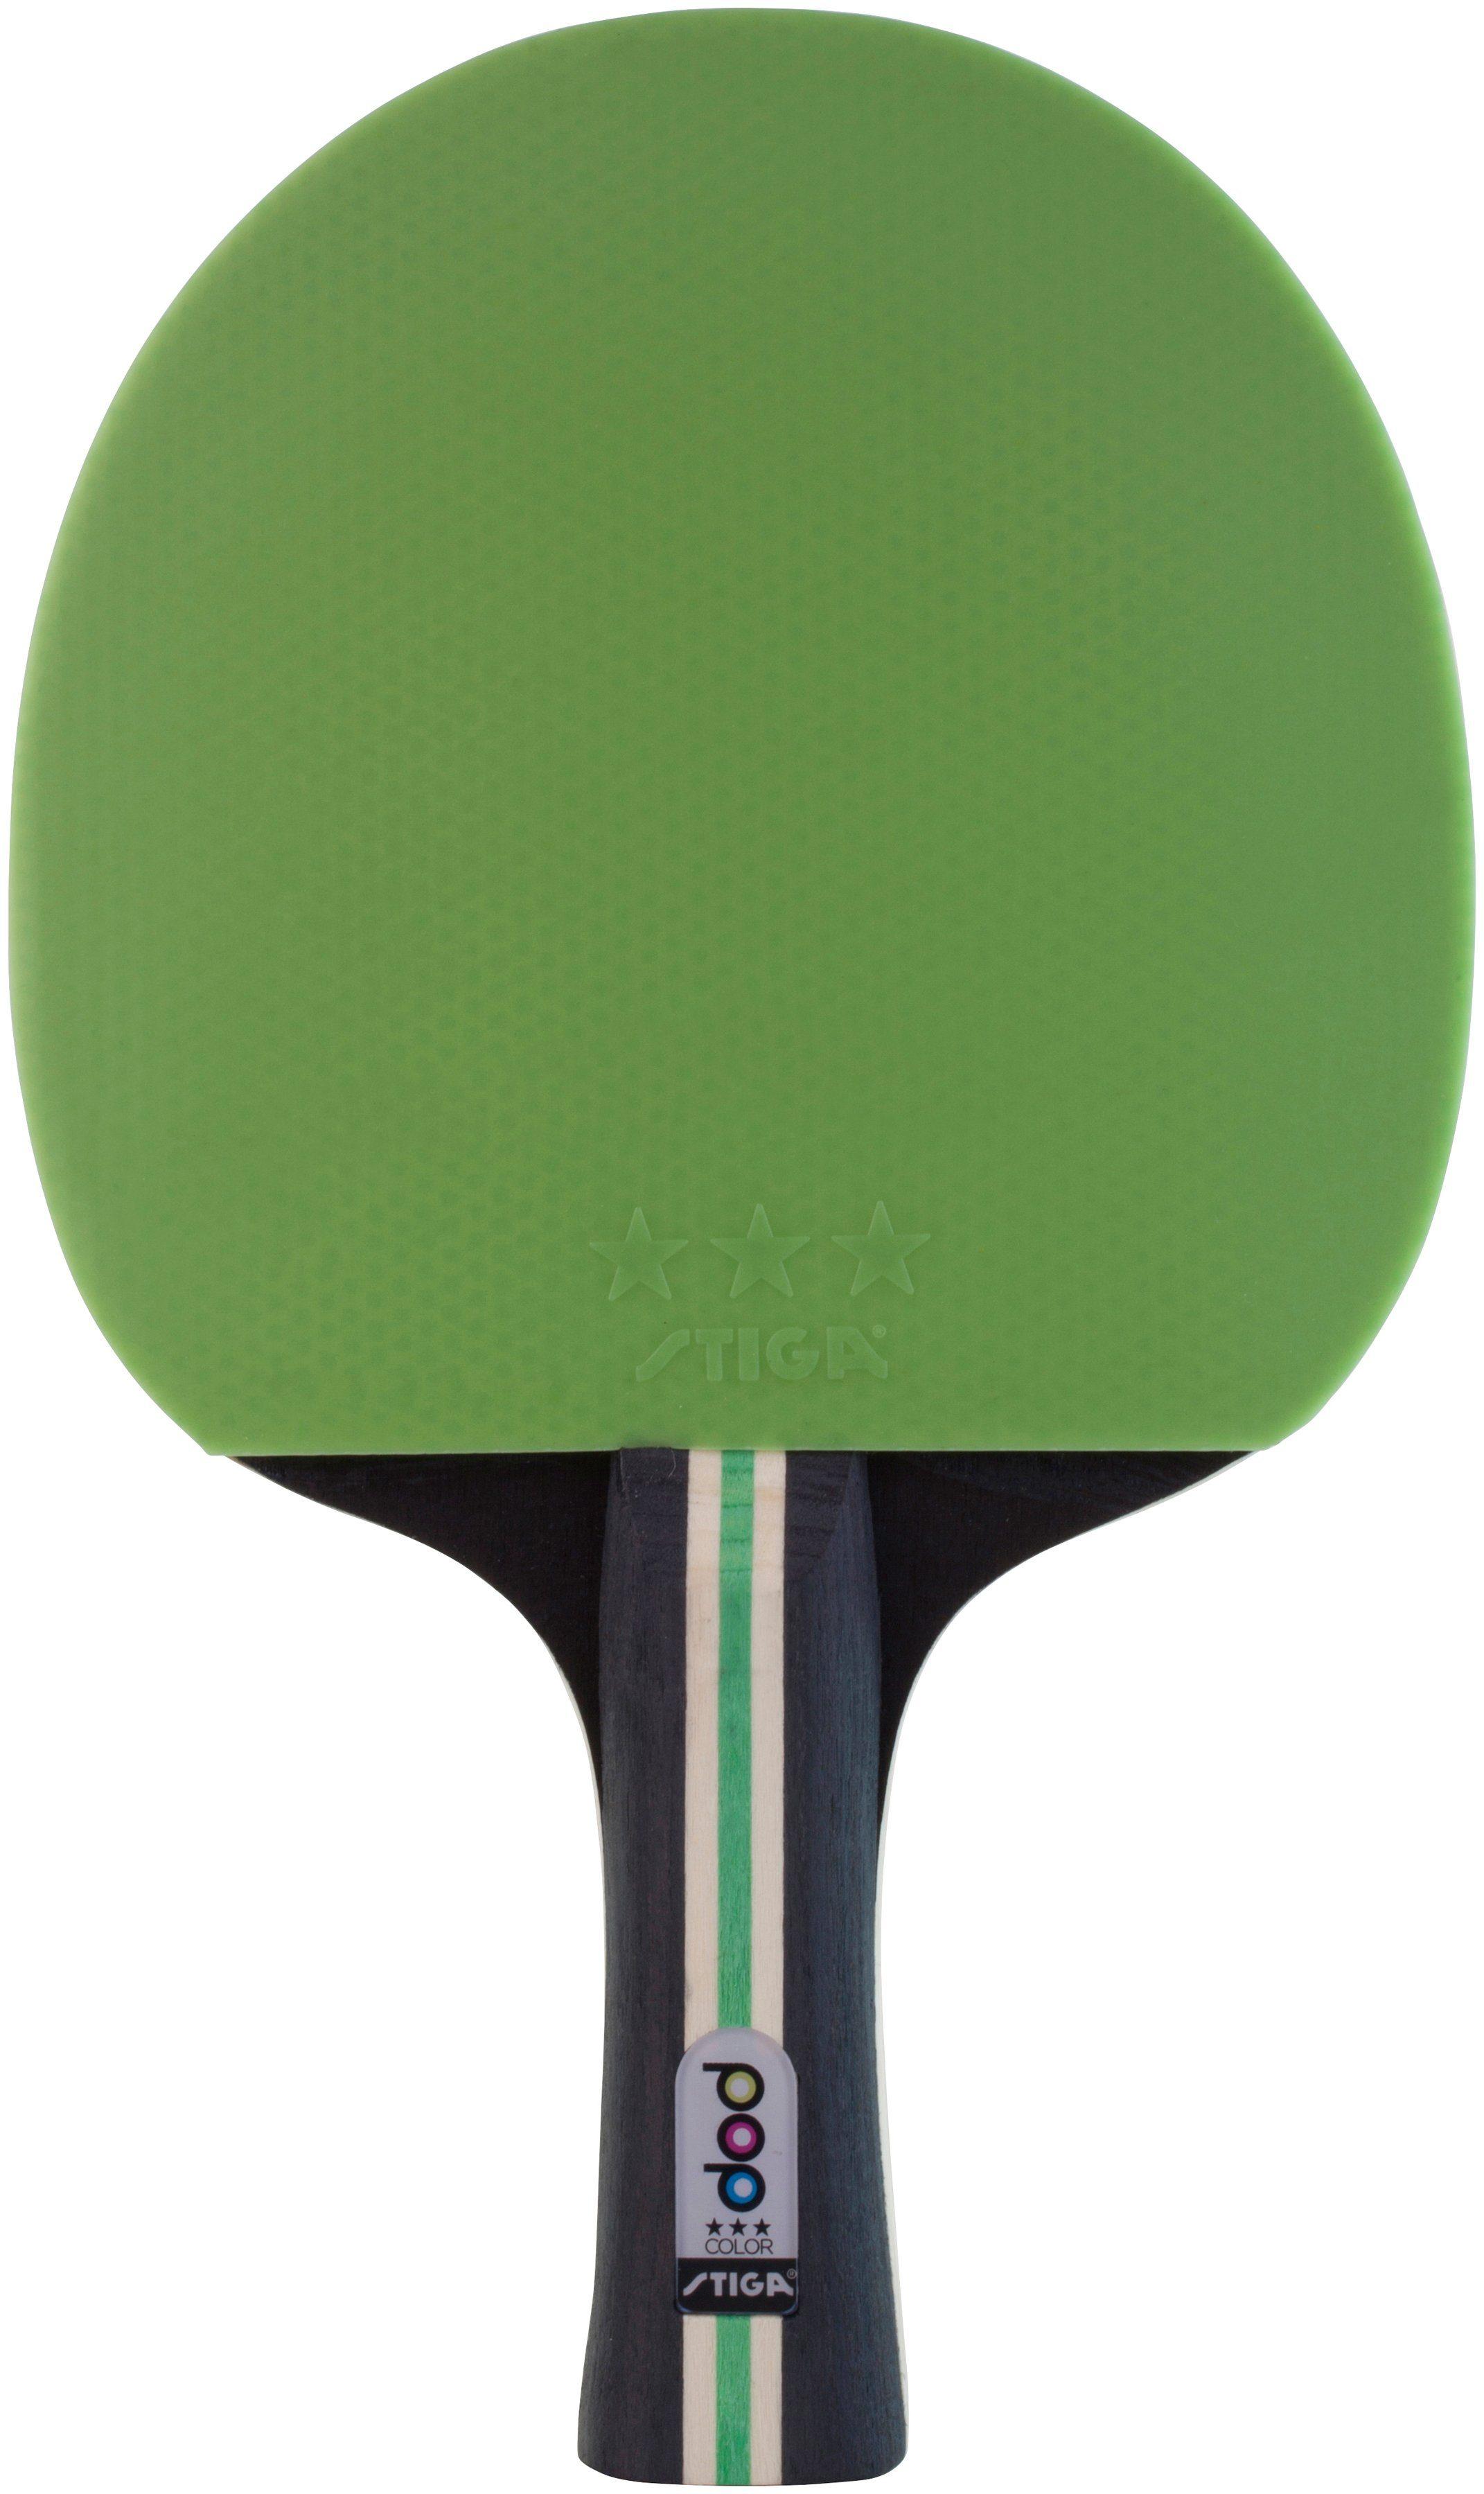 STIGA Tischtennisschläger »Pop Color grün«